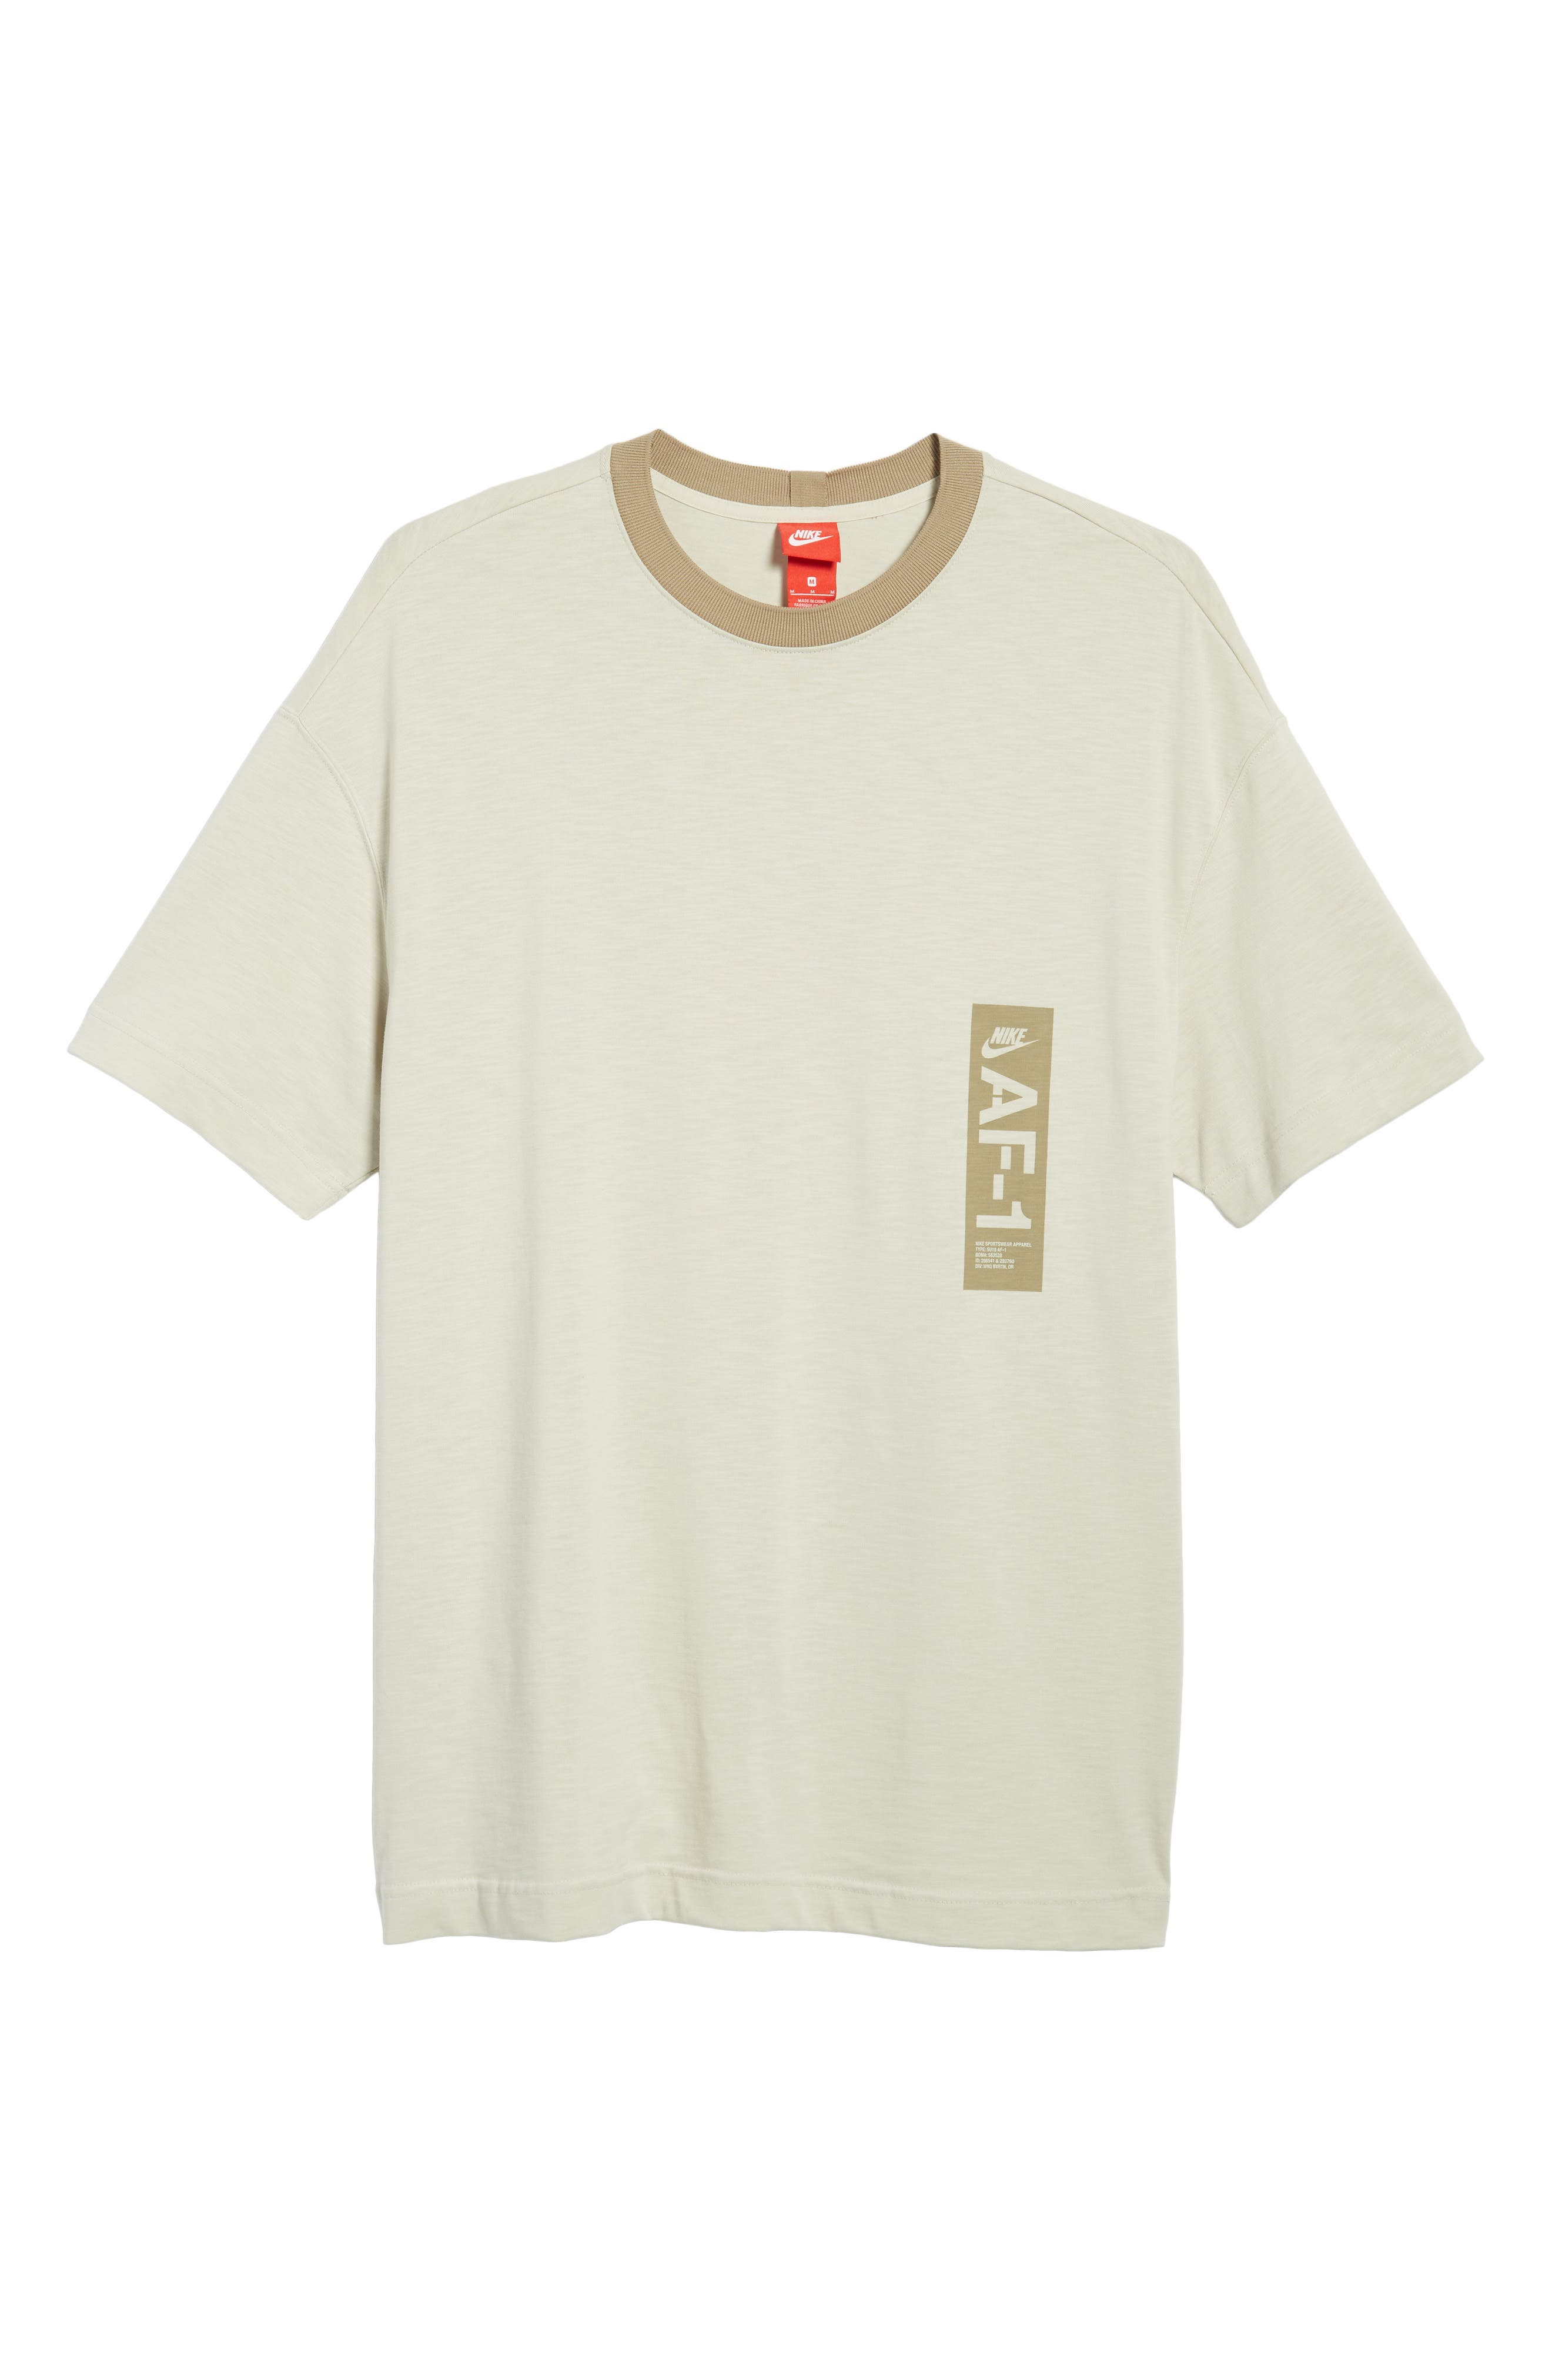 Sportswear AF1 Graphic T-Shirt,                             Alternate thumbnail 6, color,                             LIGHT BONE/ KHAKI